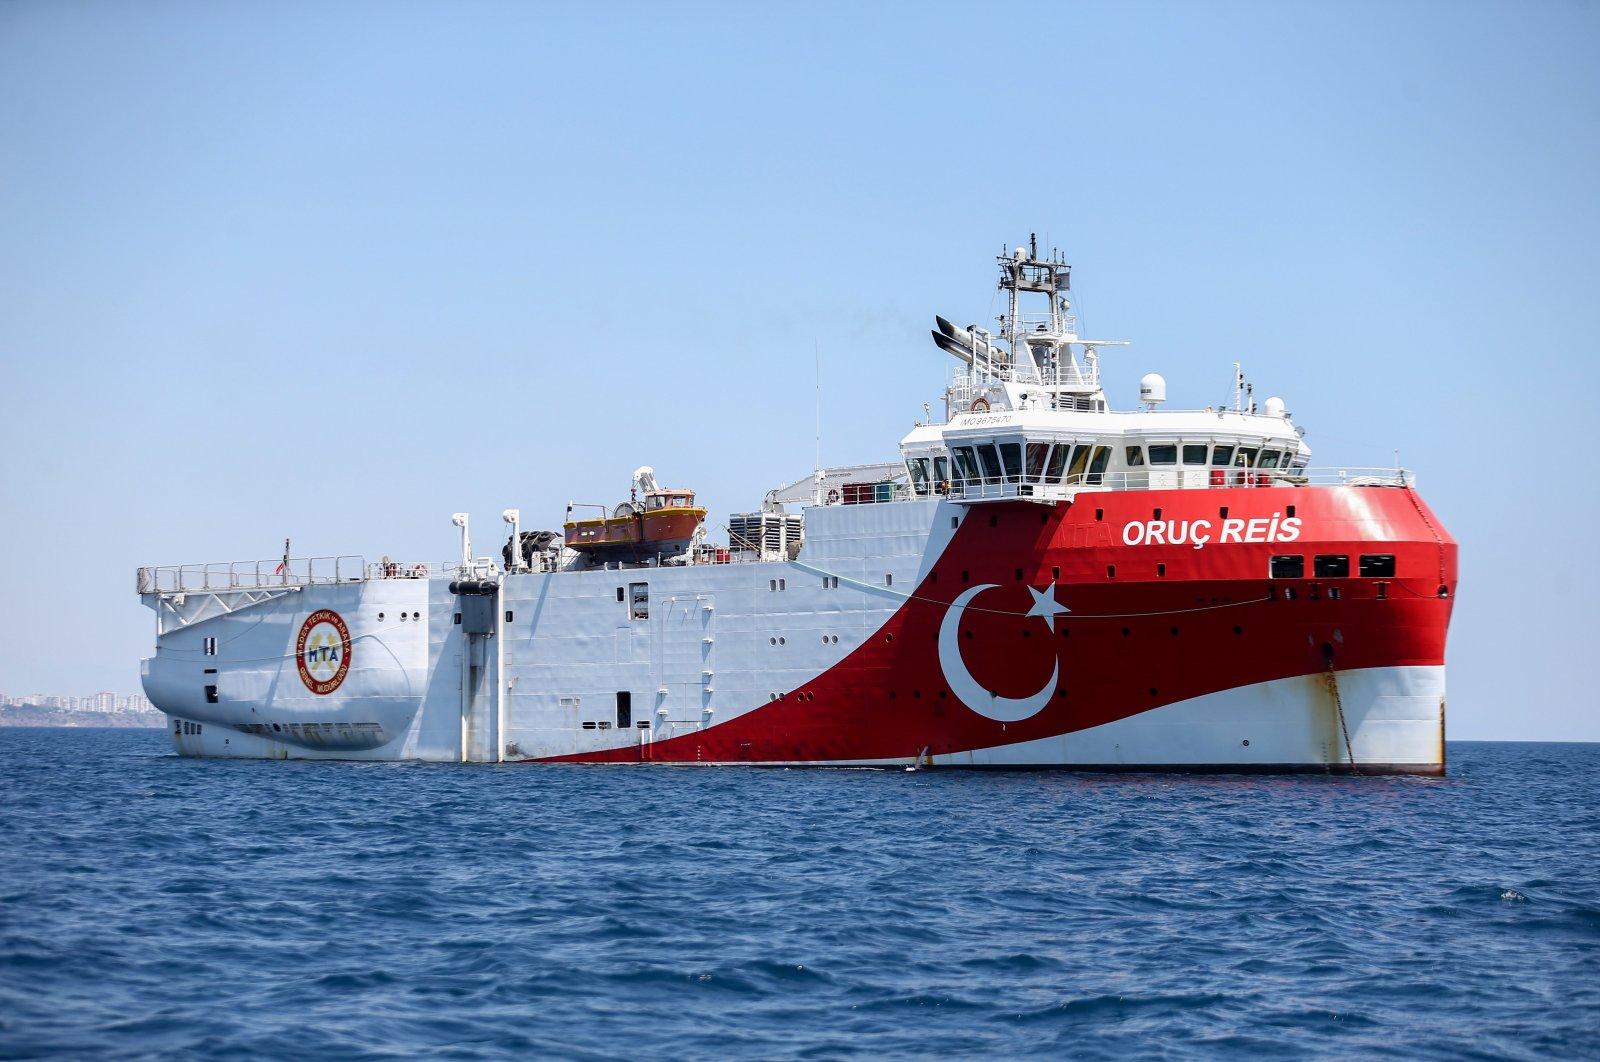 The Oruç Reis seismic exploration vessel arrives in the Eastern Mediterranean, July 24, 2020. (AA File Photo)